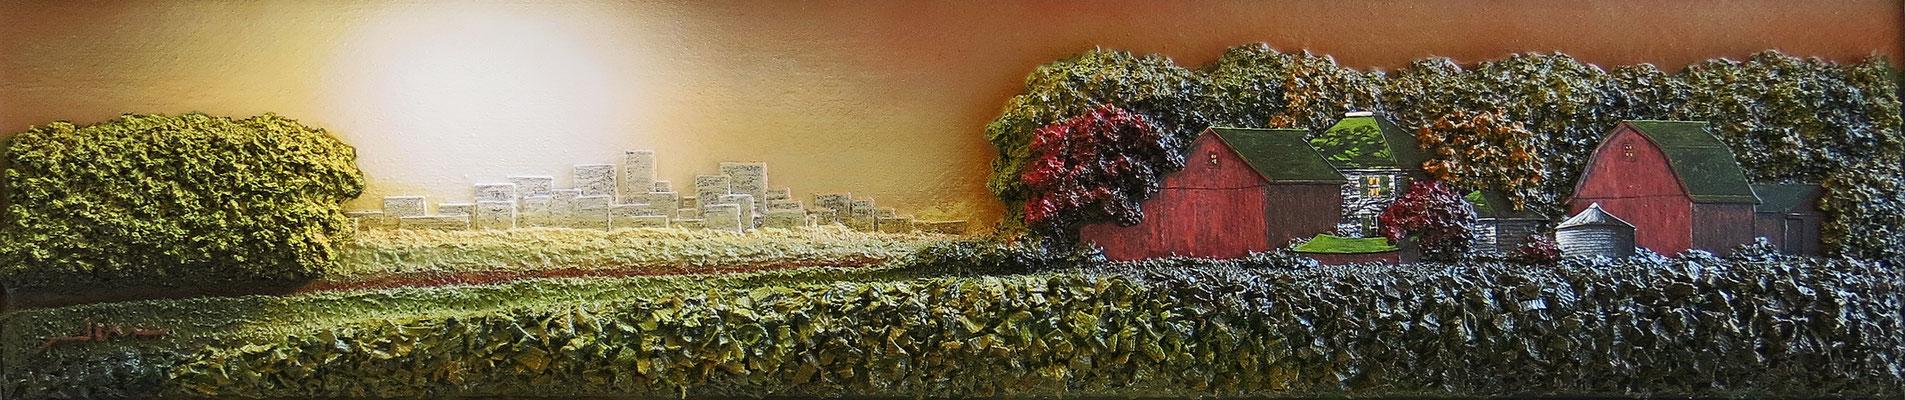 "Symbiosis by James Golaszewski, mixed media on Canvas  9 x 45"" x 5""  $3500 framed"